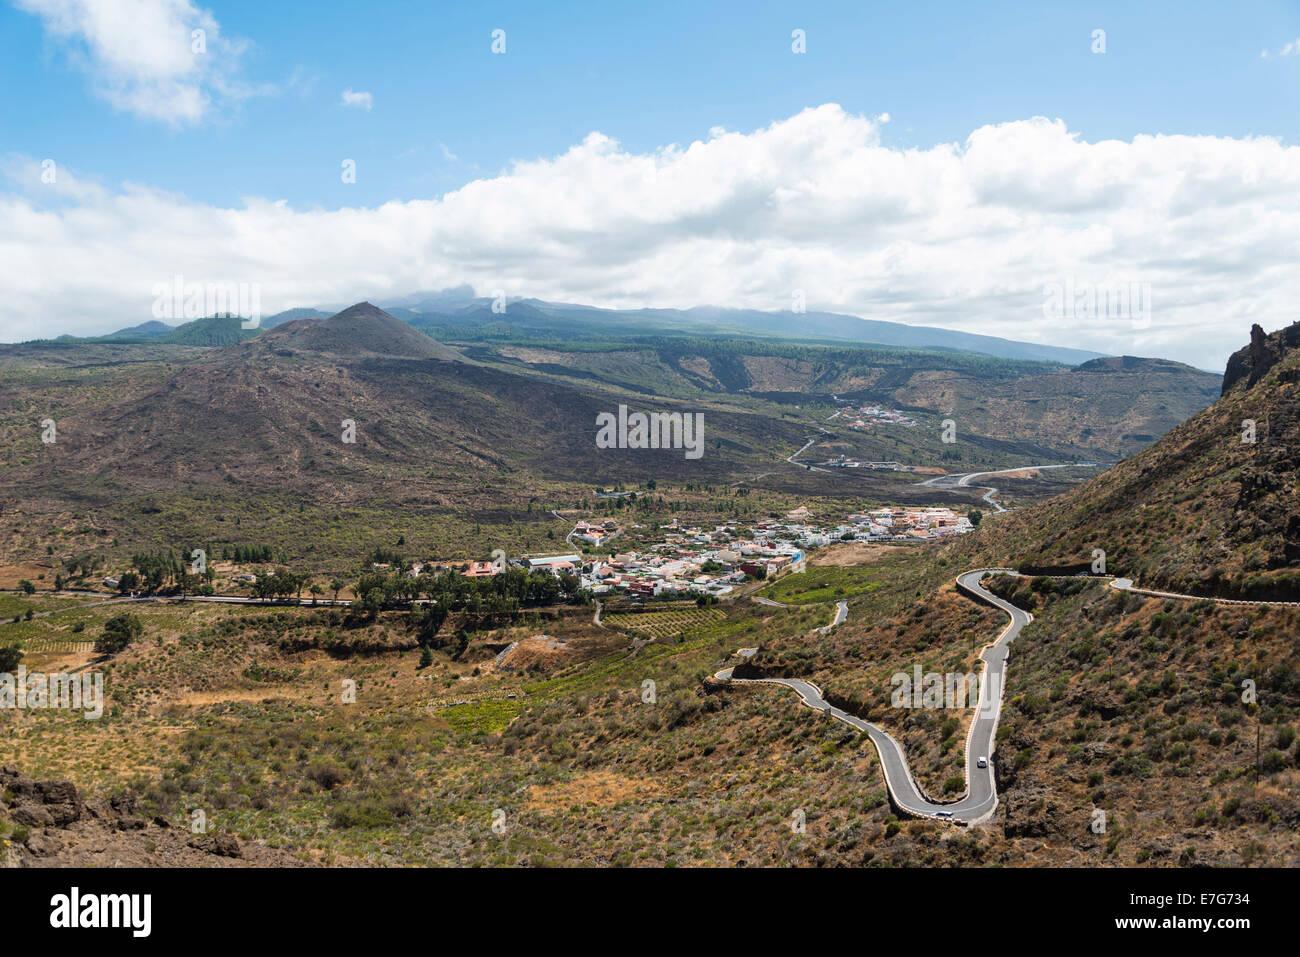 Winding road, volcanic landscape, Santiago del Teide, Tenerife, Canary Islands, Spain - Stock Image